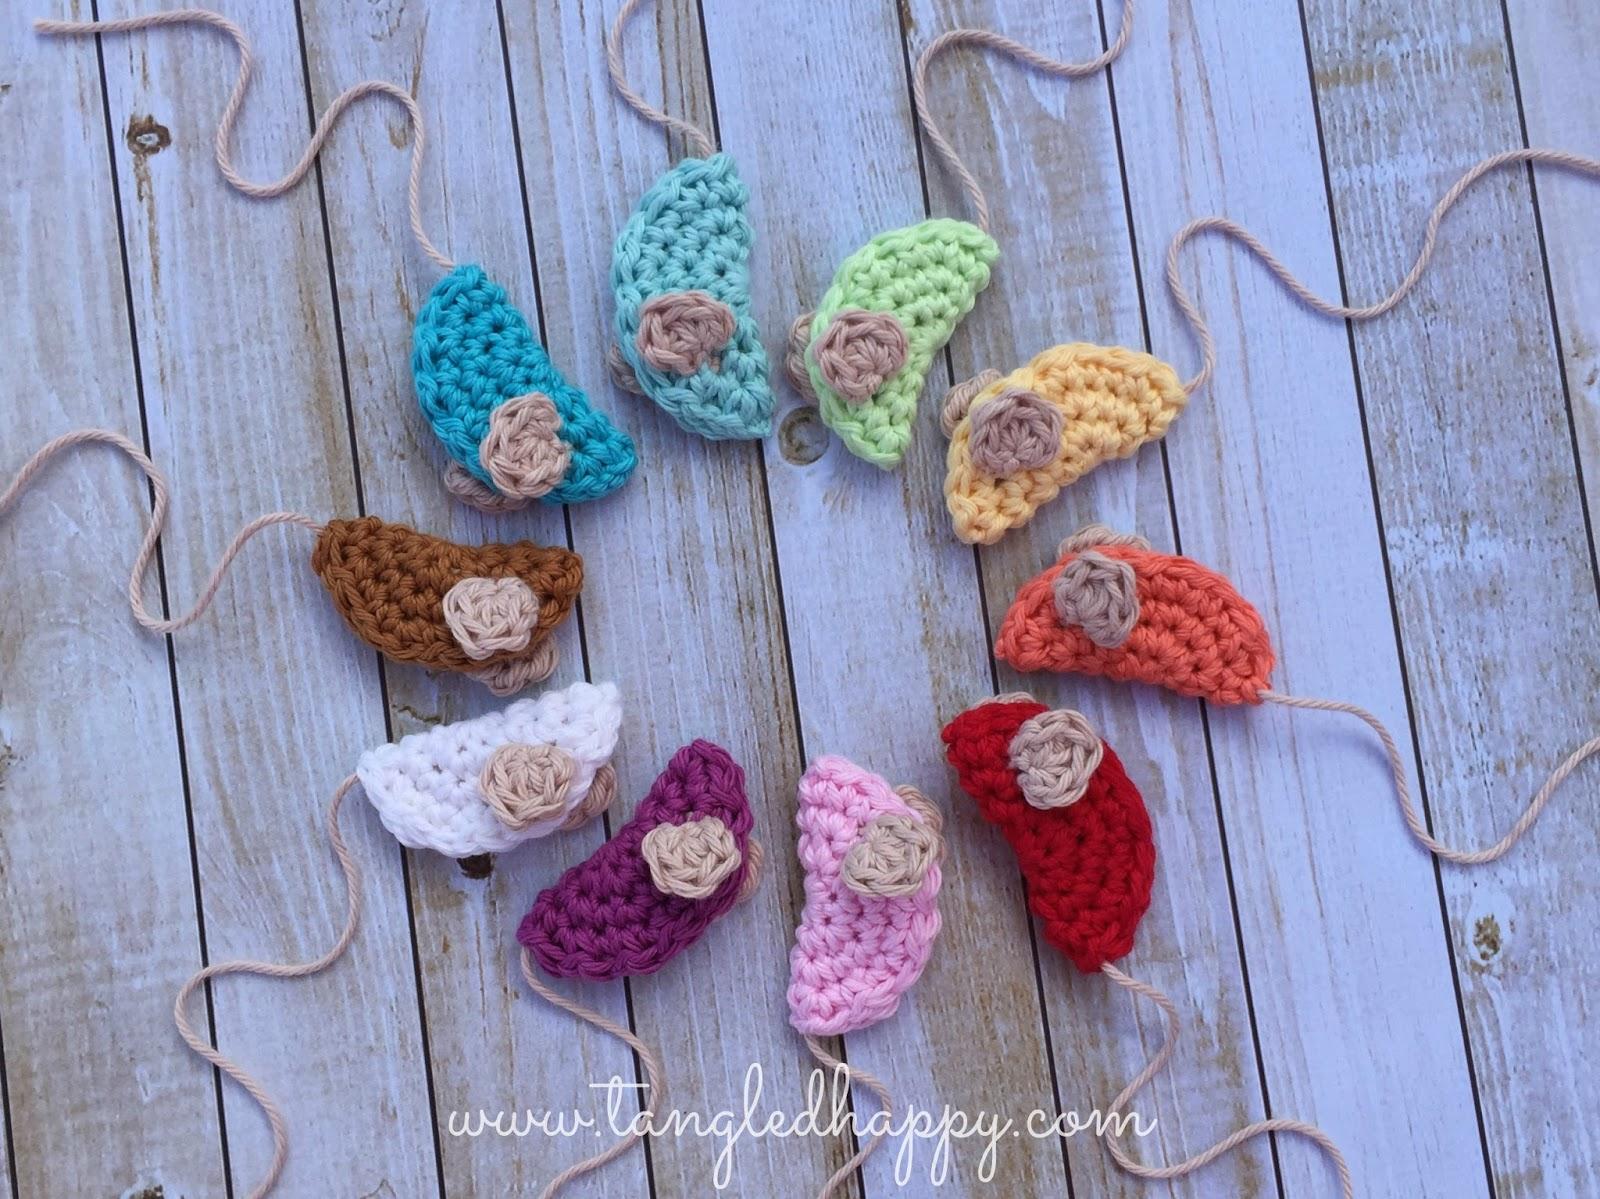 tangled happy crochet mouse diy cat toy free crochet pattern